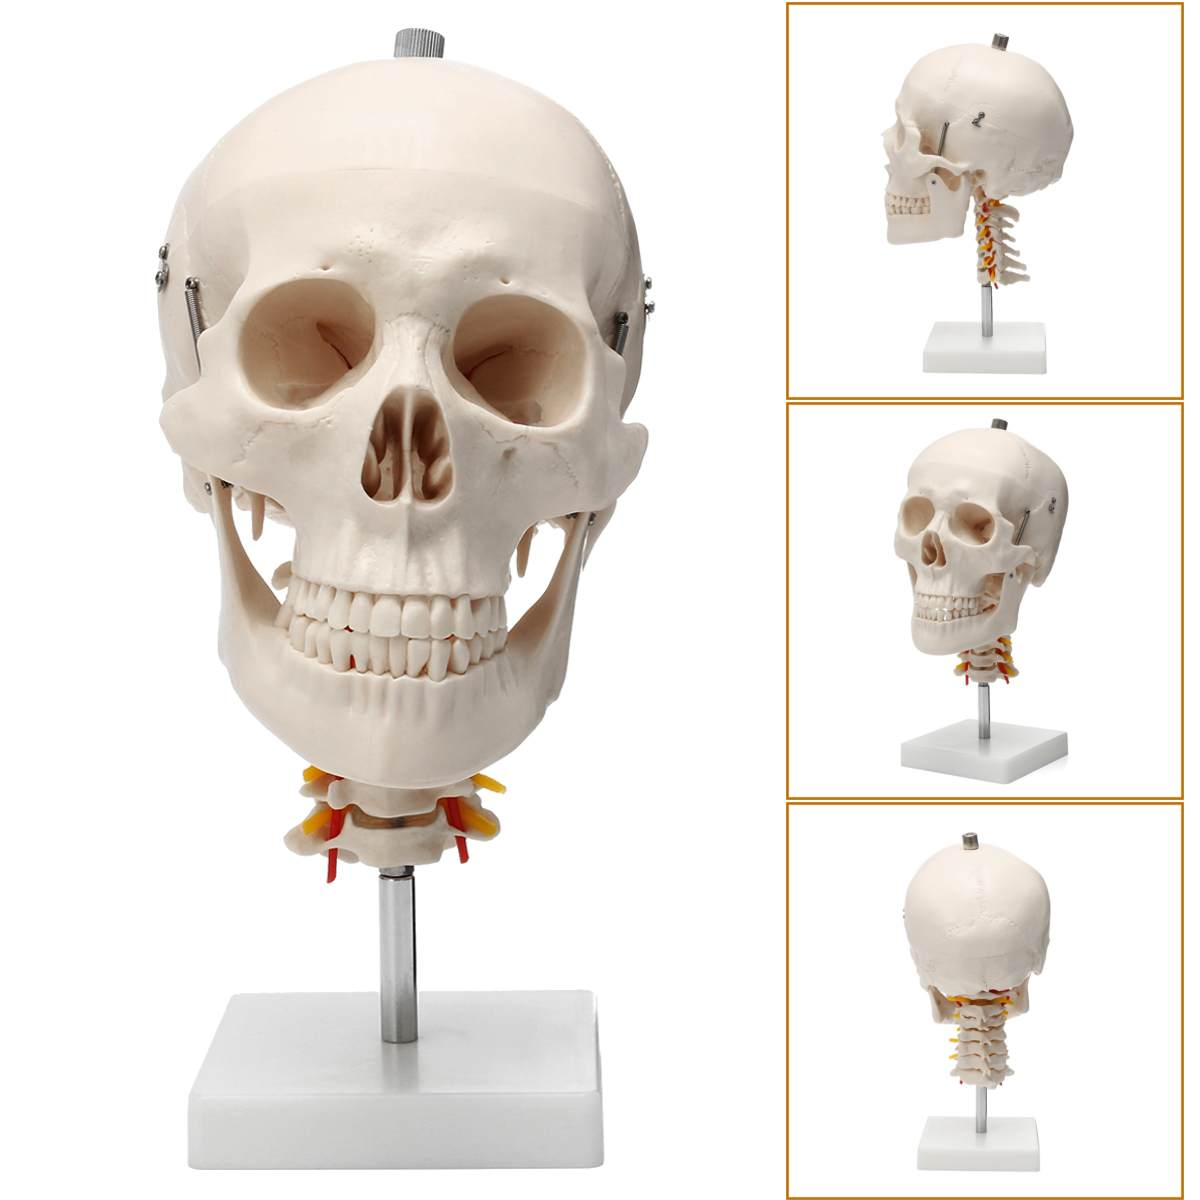 1:1 Life Size Human Skull Anatomical Anatomy Skull Model Cervical Spine Head Skeleton School Educational Medical Teaching